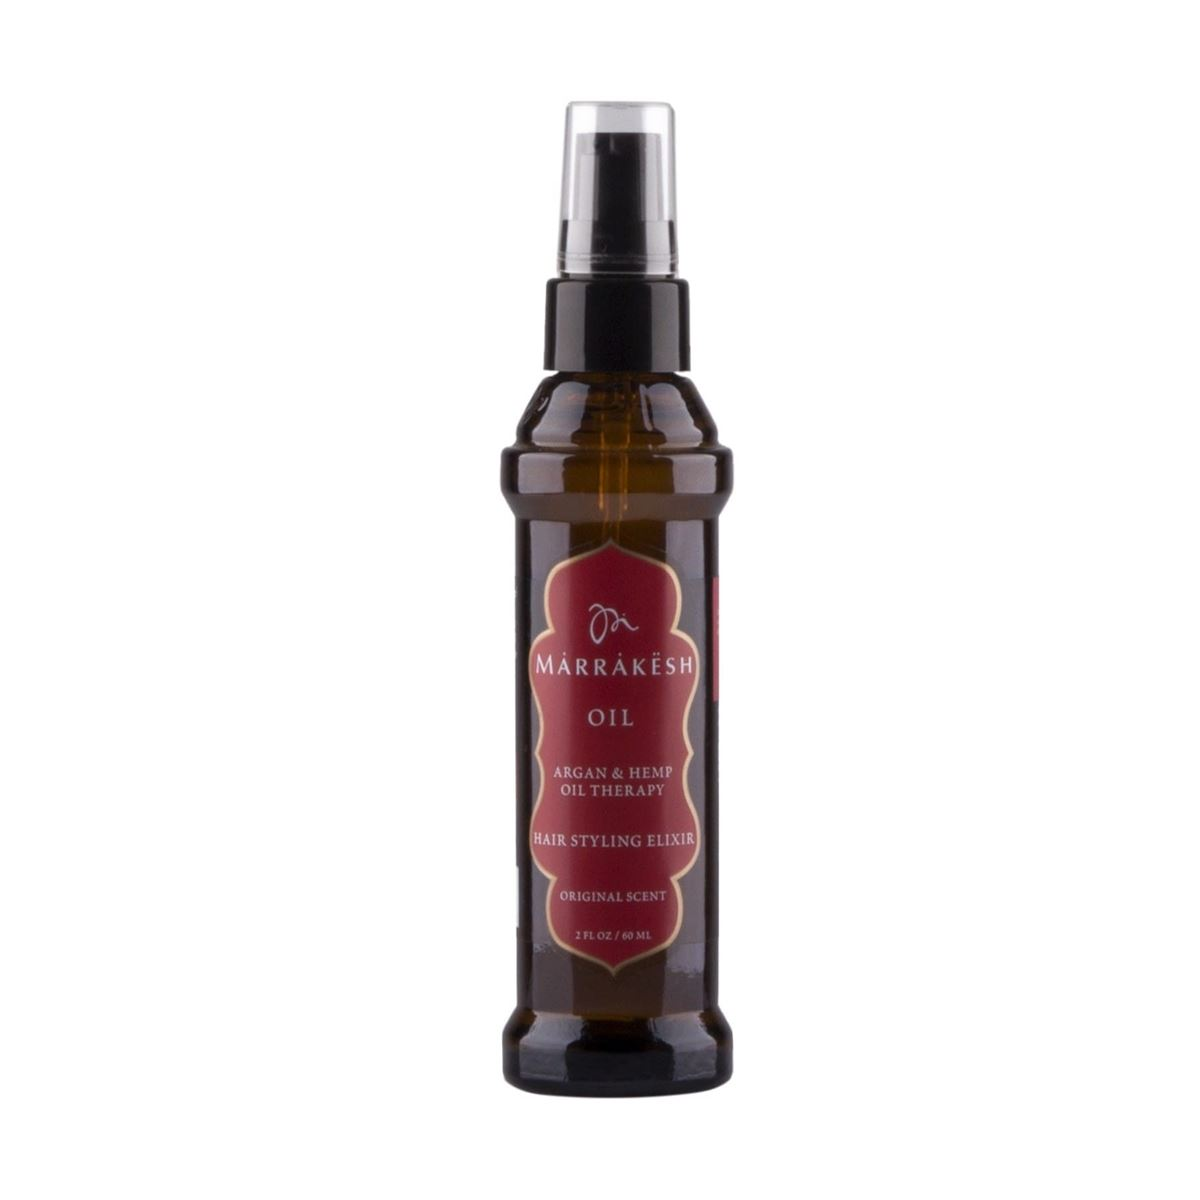 Marrakesh Oil Argan & Hemp Oil Therapy 60ml